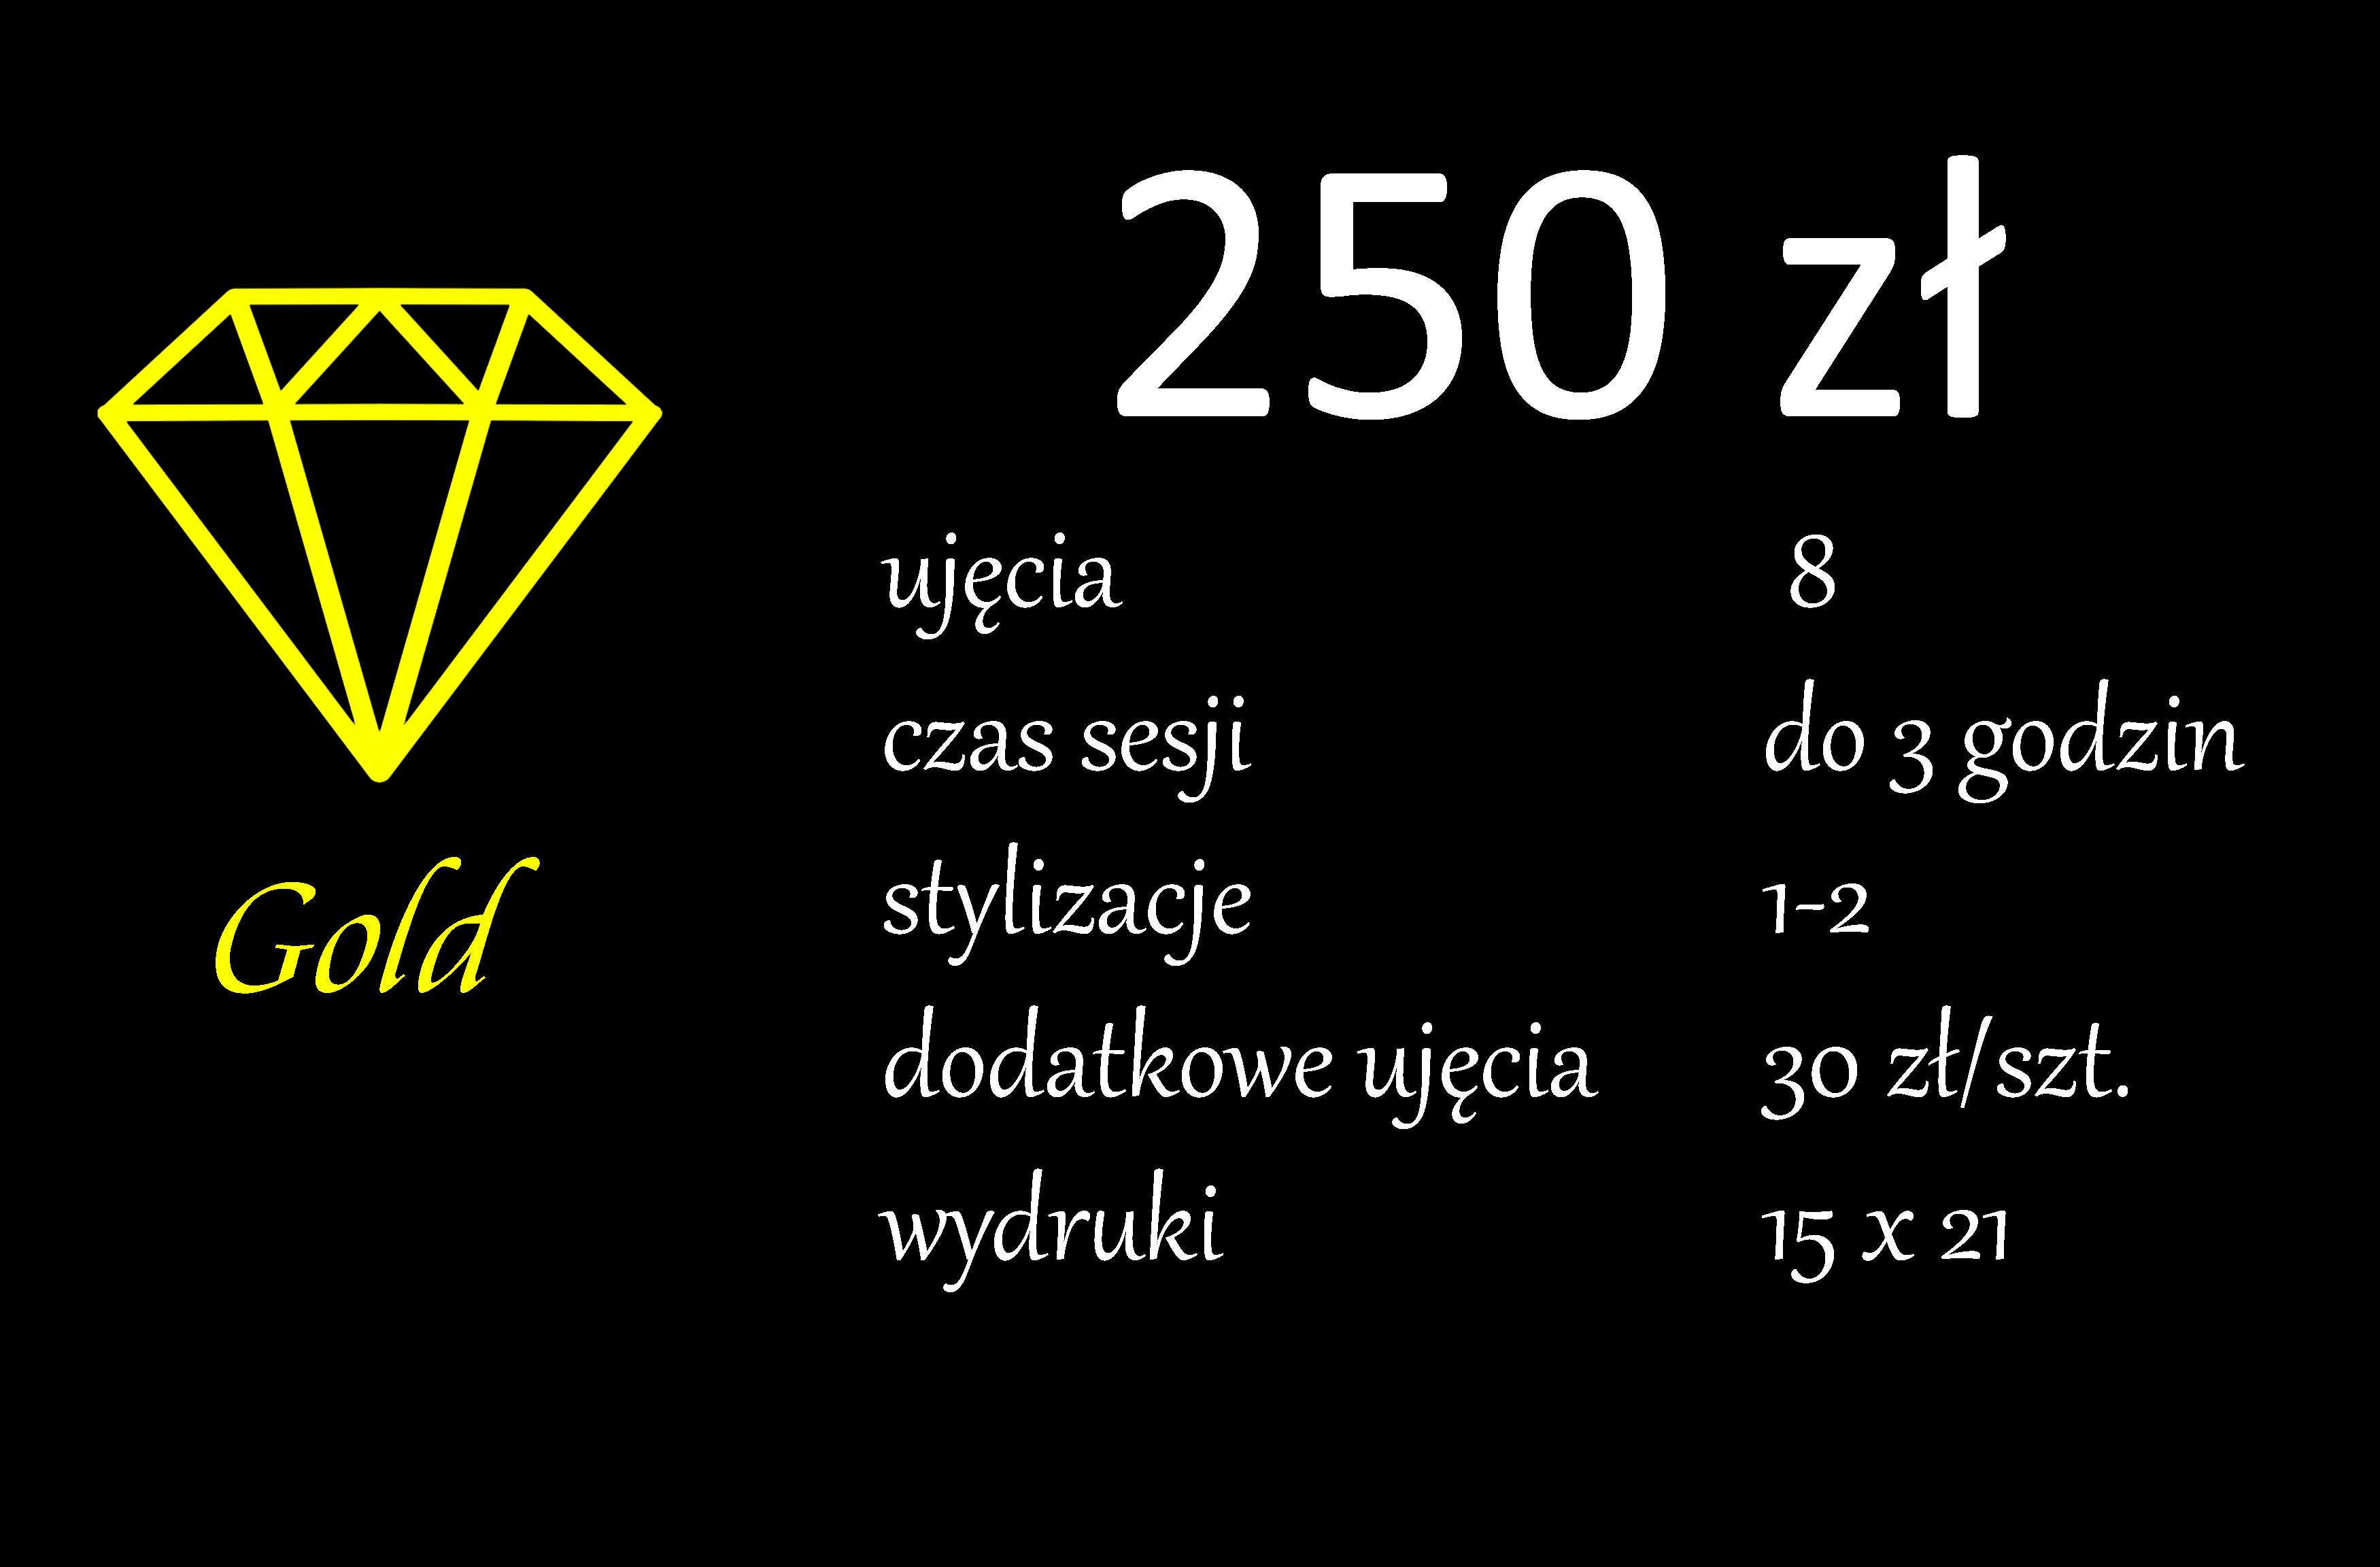 noworodkowy_gold